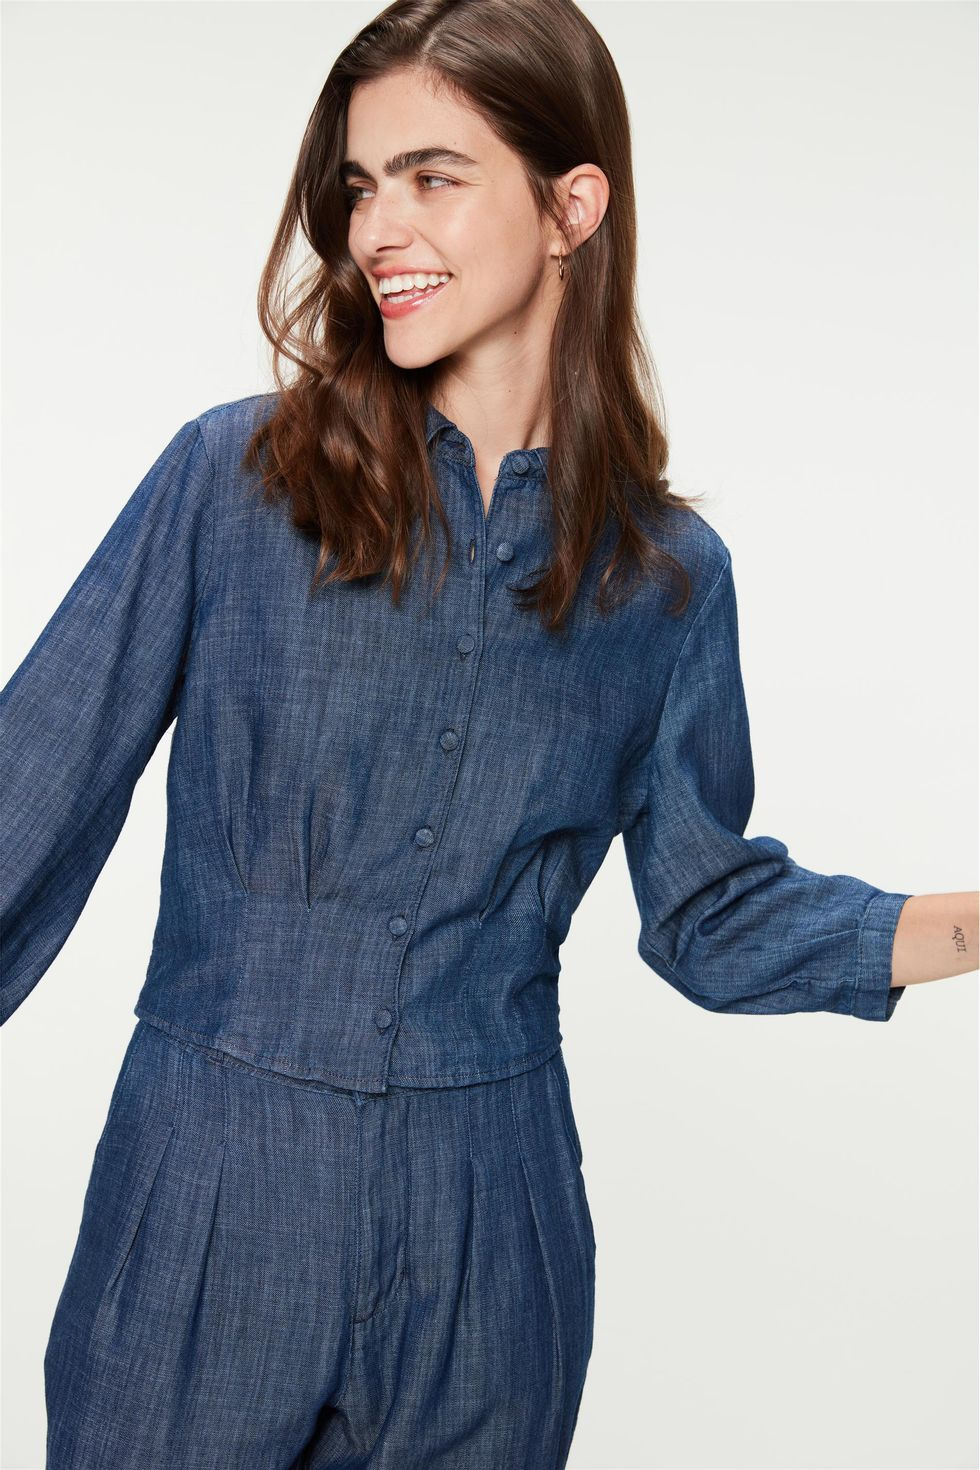 Camisa-Jeans-Mangas-Bufantes-e-Pregas-Frente--